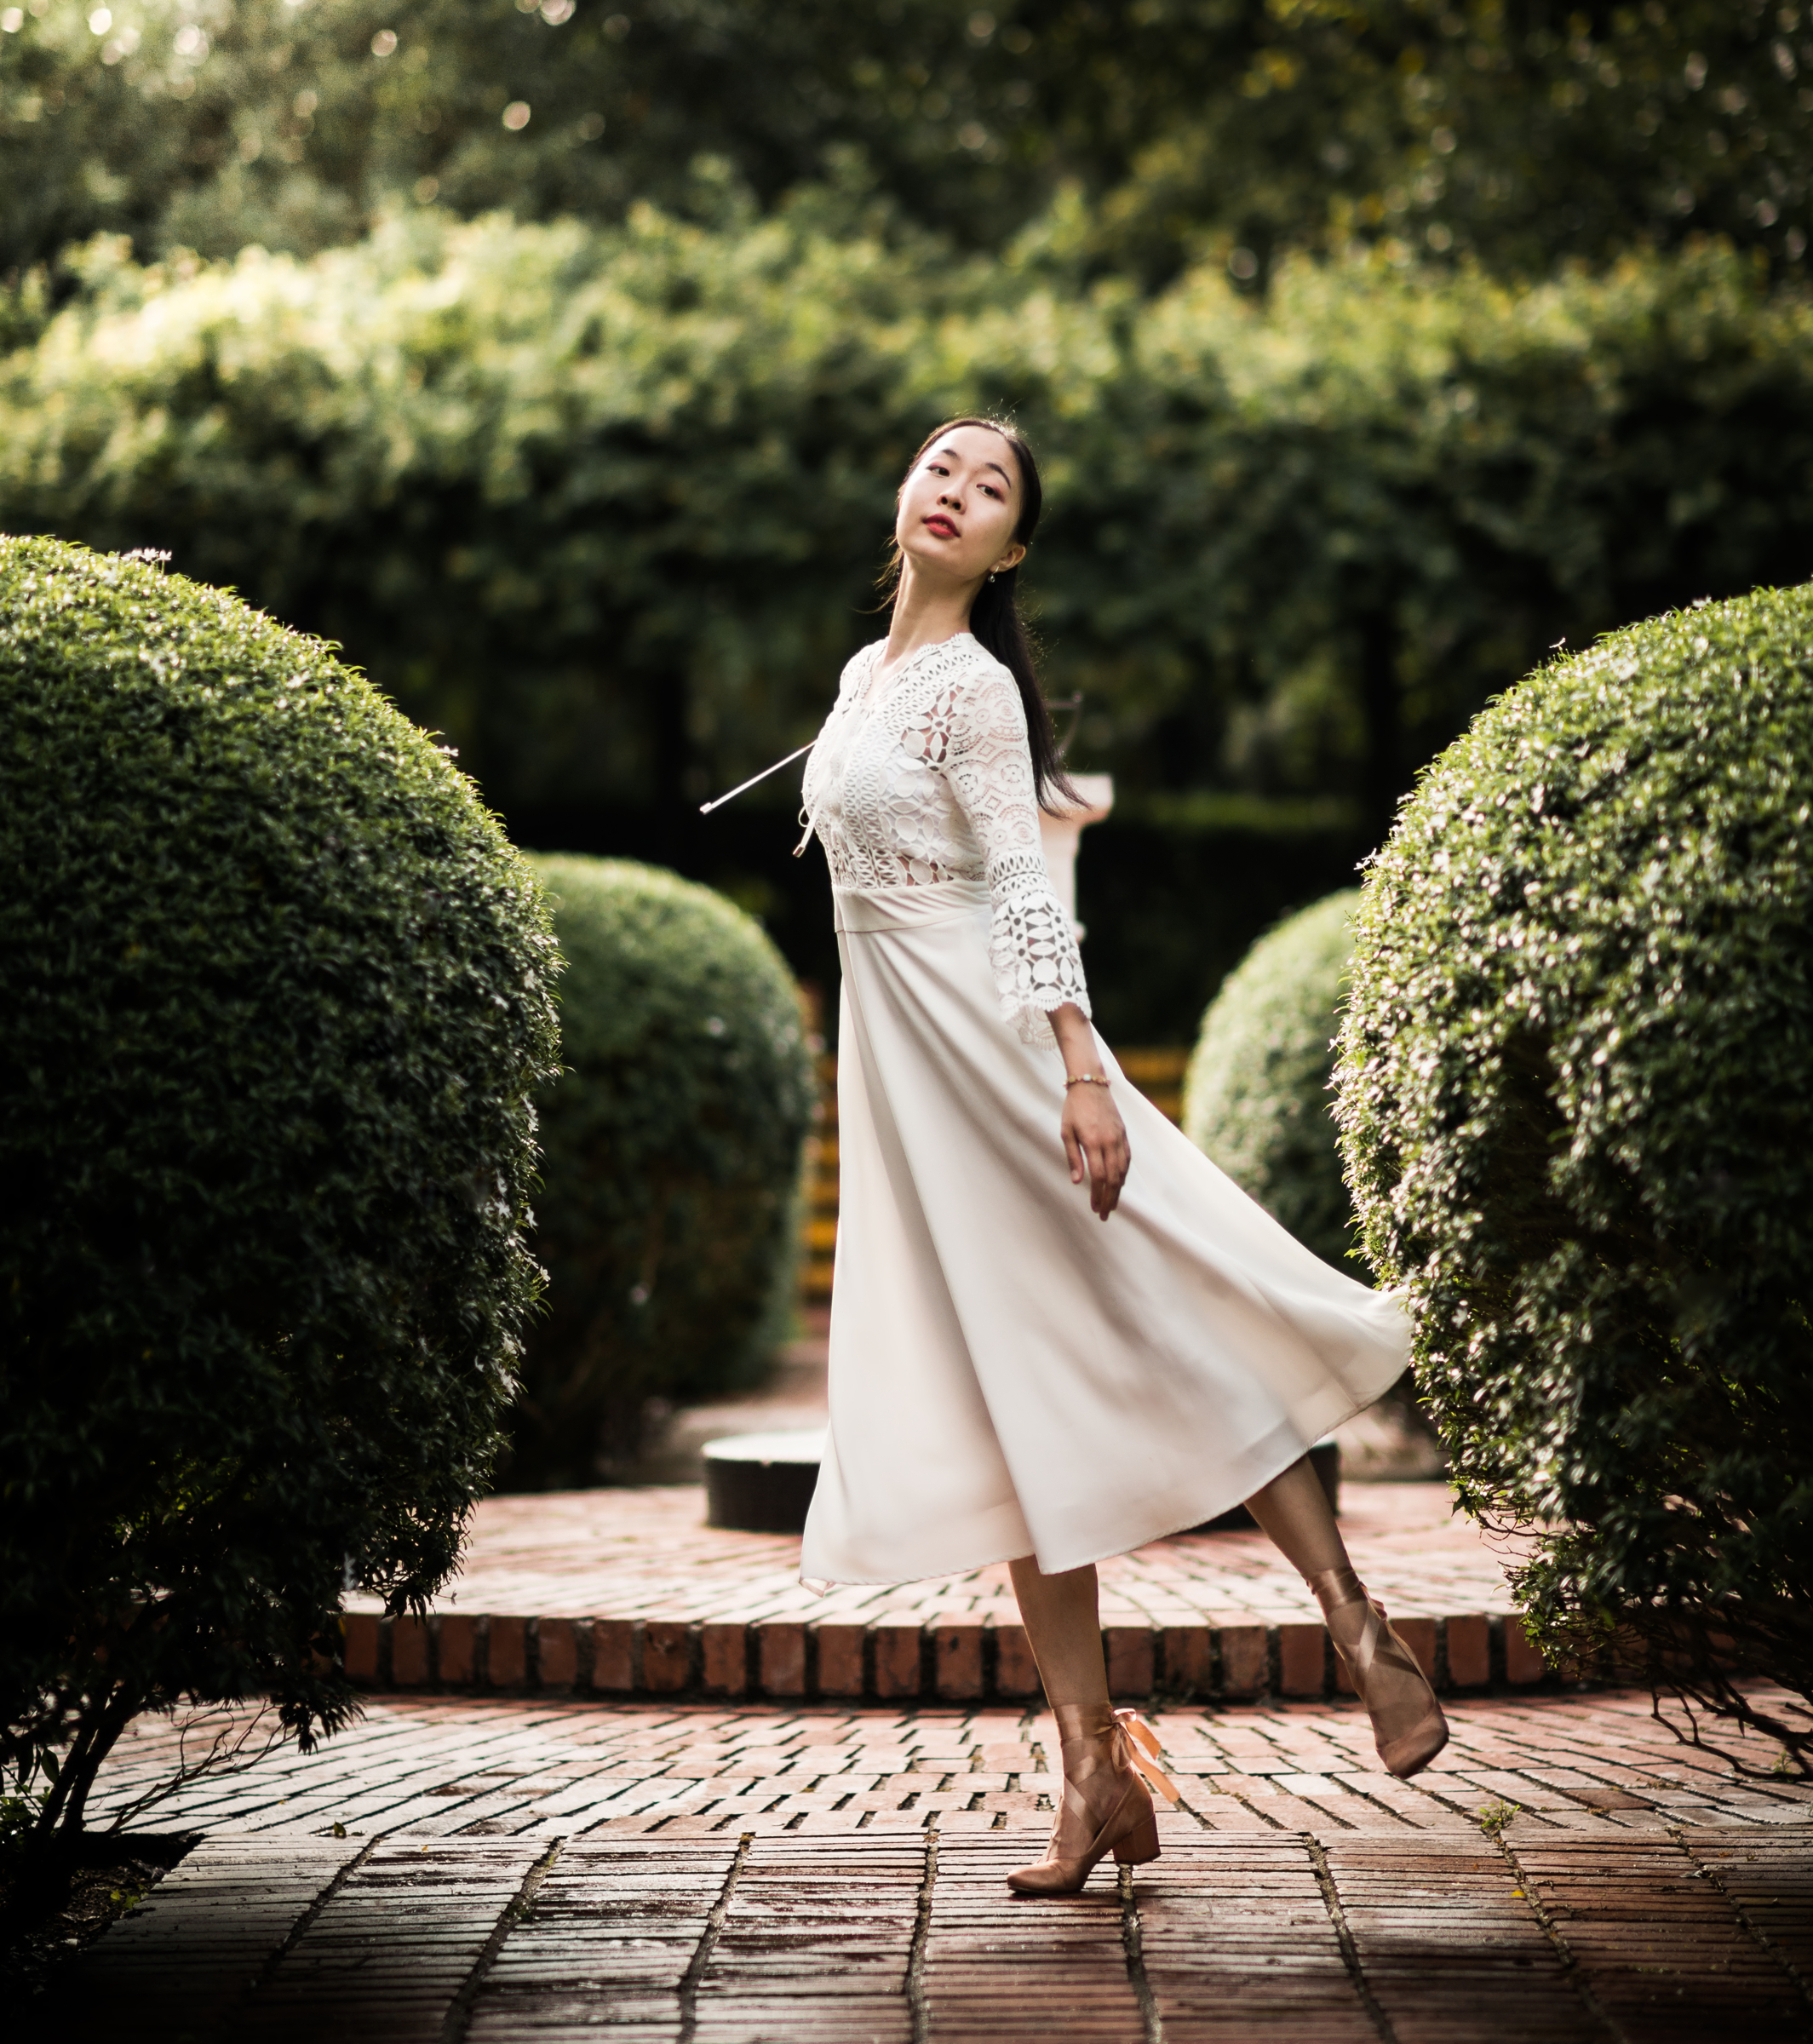 Zikki Lin in the garden